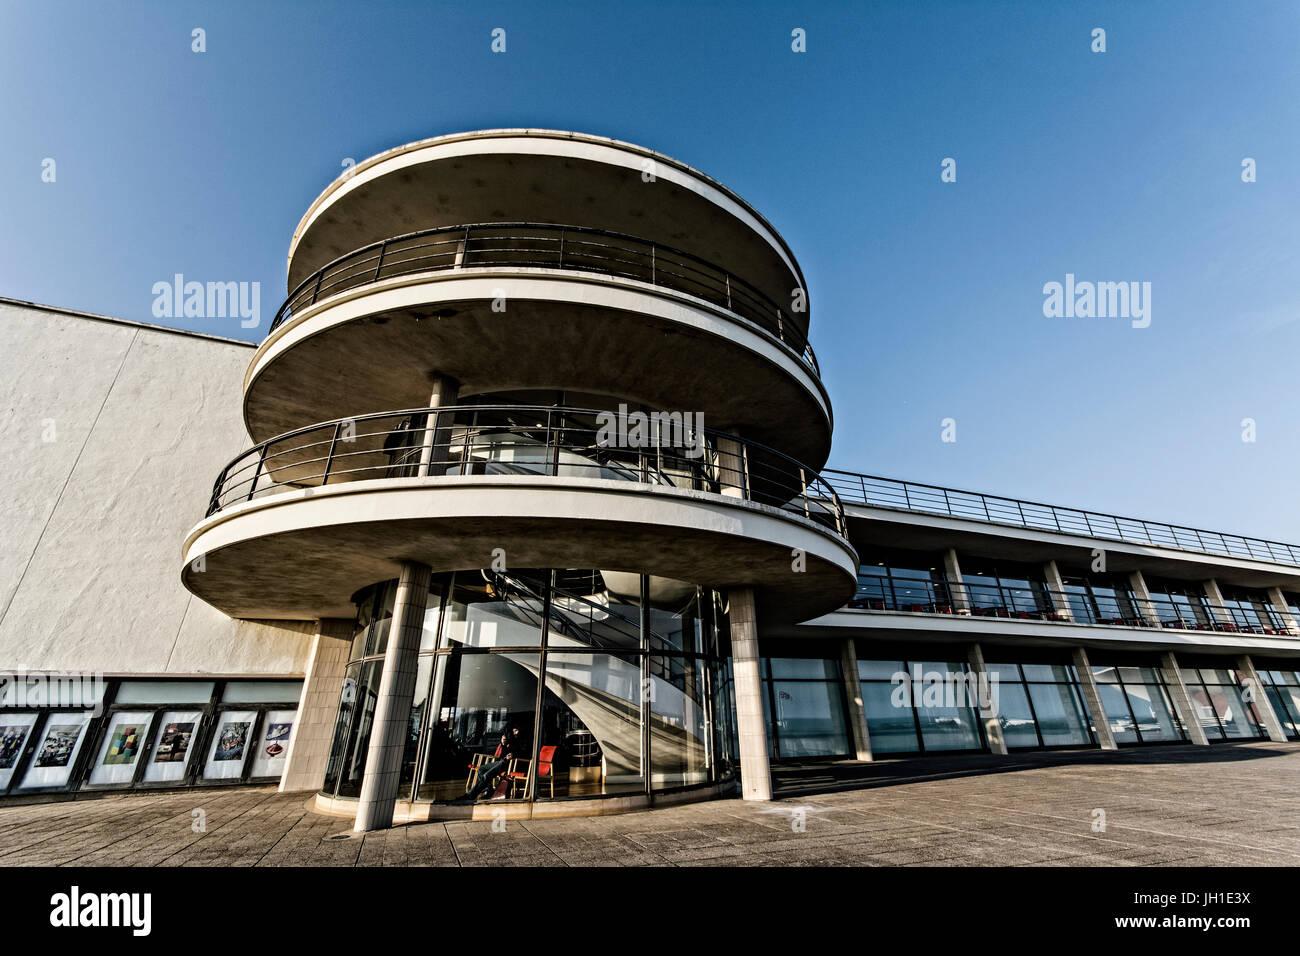 De La Warr Pavilion south Elevation, Bexhill On Sea, East Sussex - iconic modernist building.   Architects Erich - Stock Image